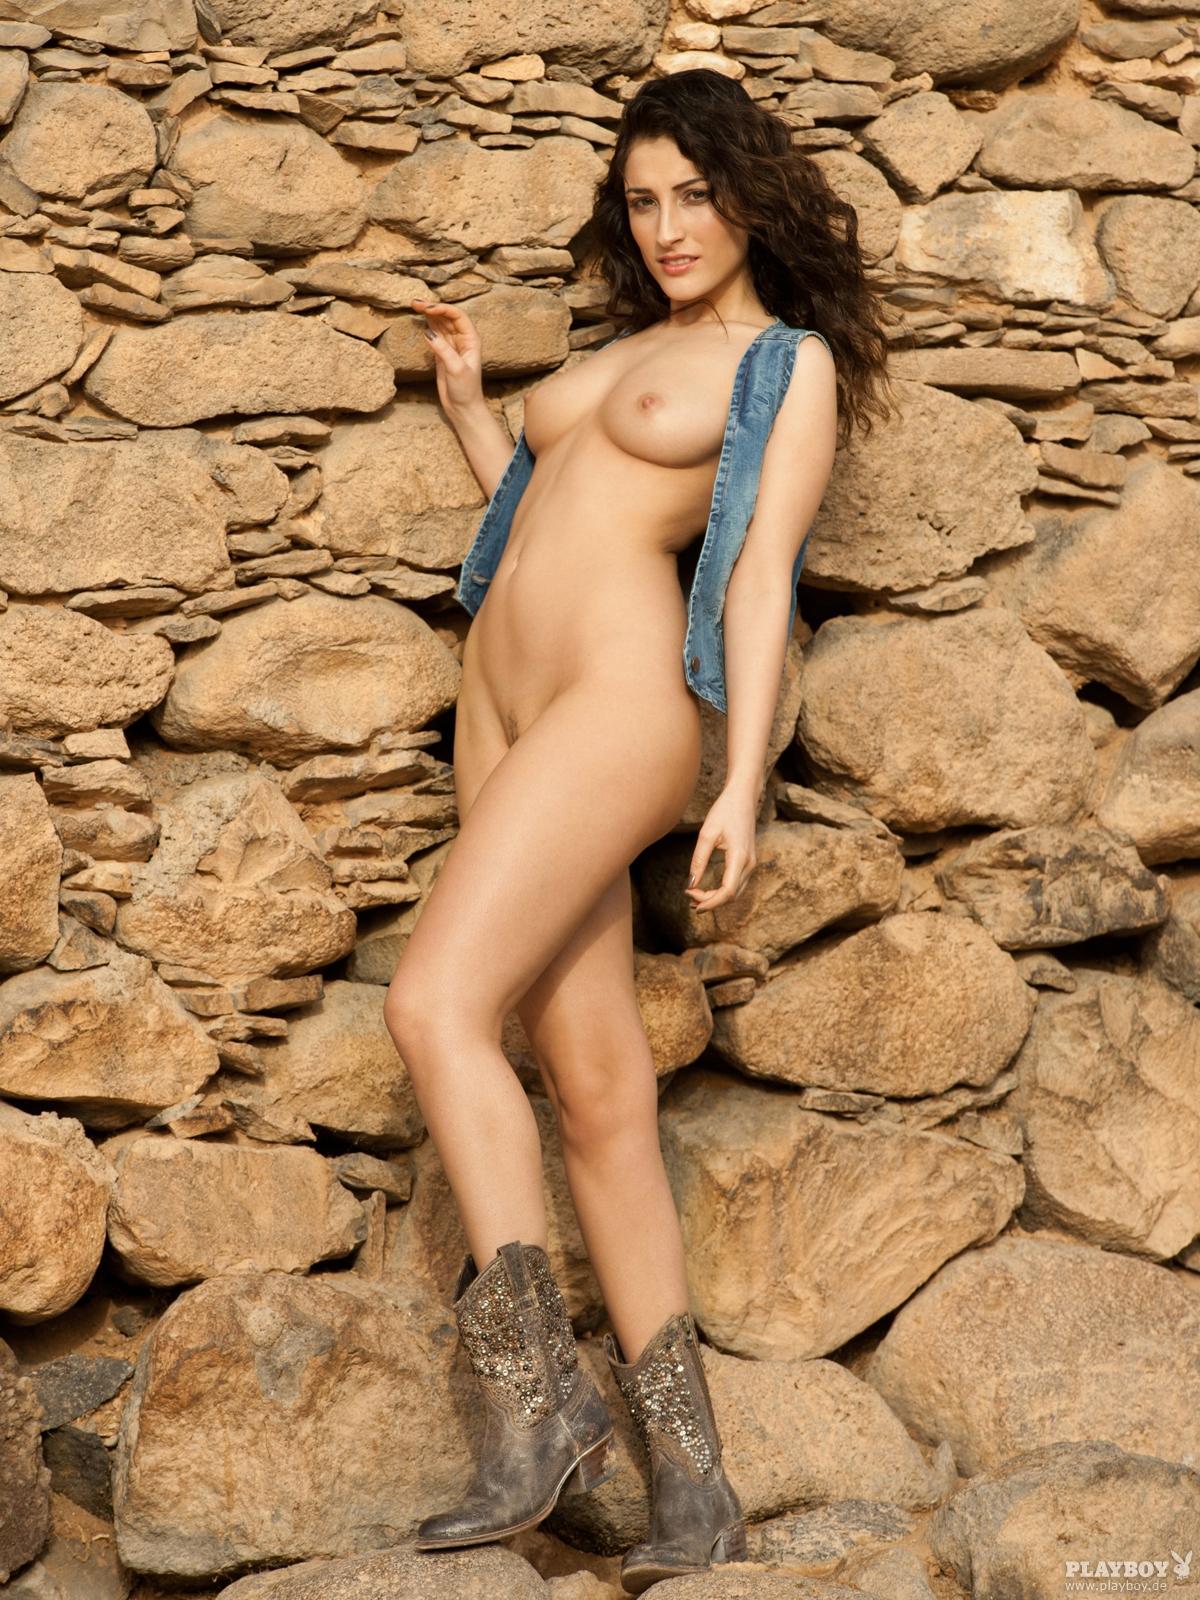 Playboy Hot Women From Turkey Aylin Alp Of Germany  The -4028